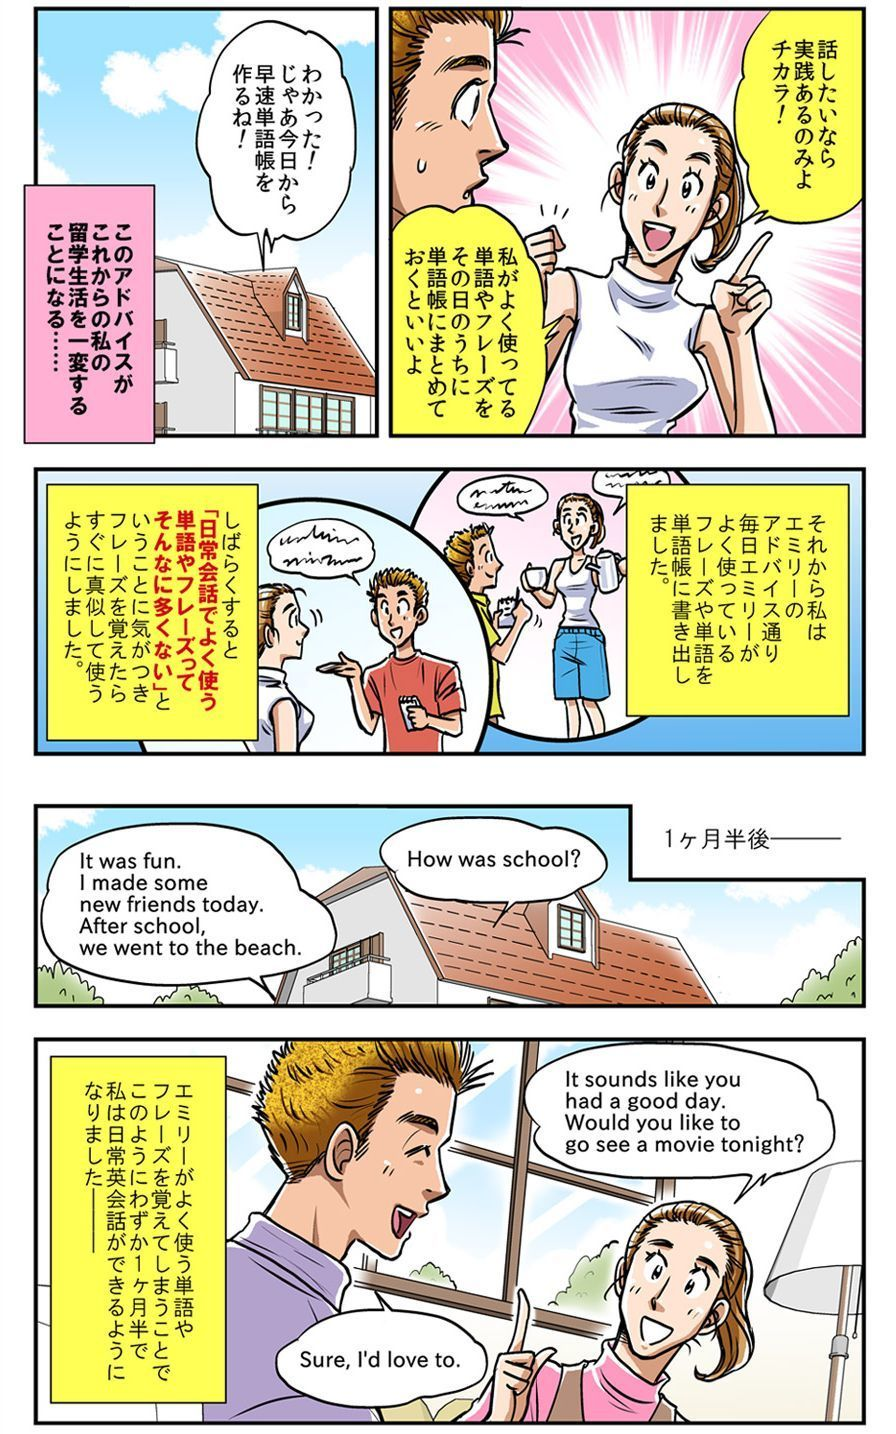 manga-img02.jpg